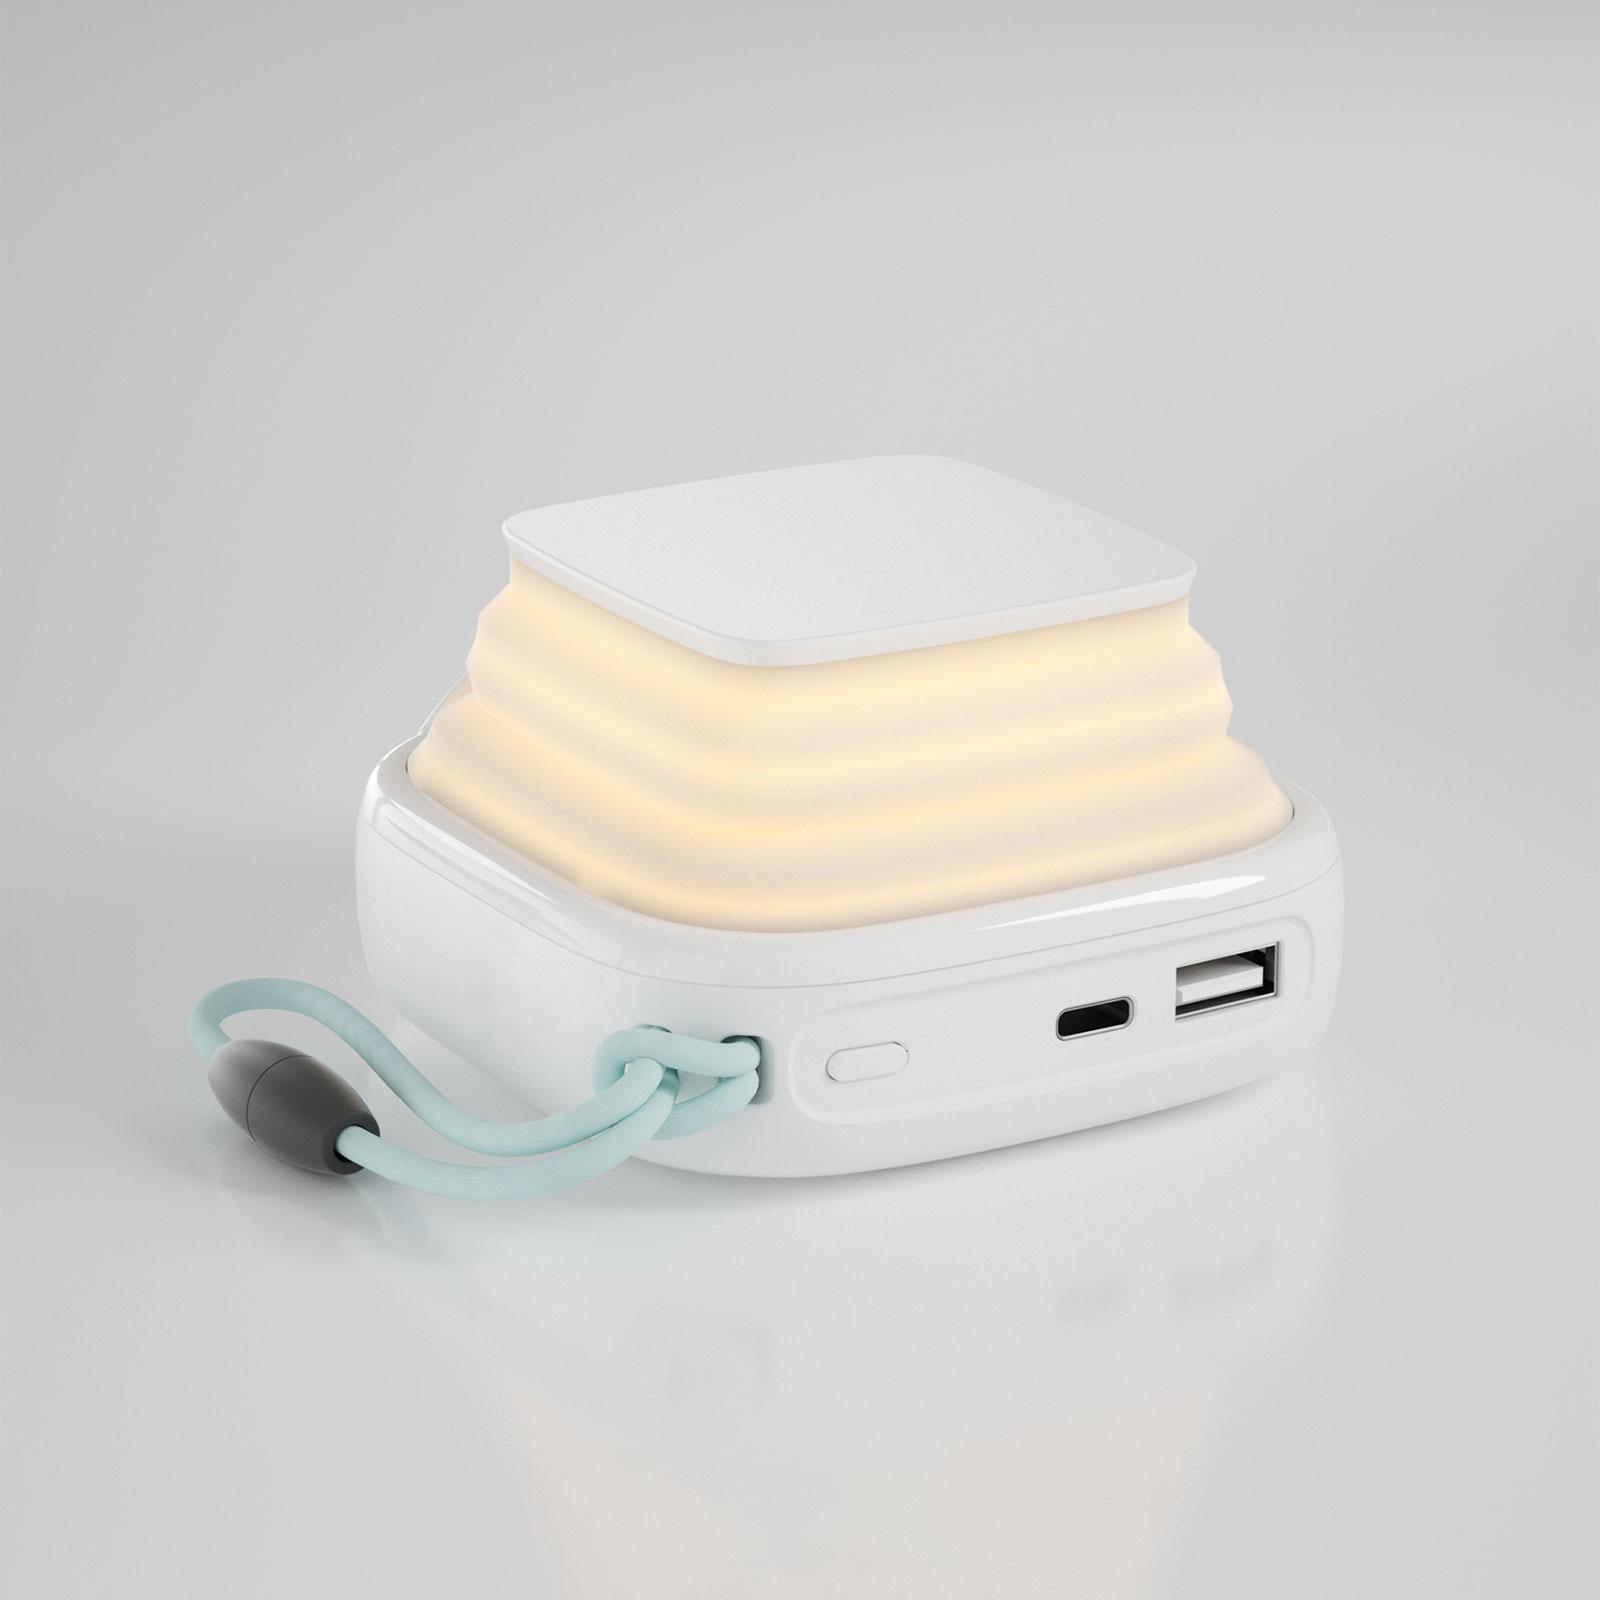 MiPow PopCandle 10000 Ladegerät mobil, Nachtlicht